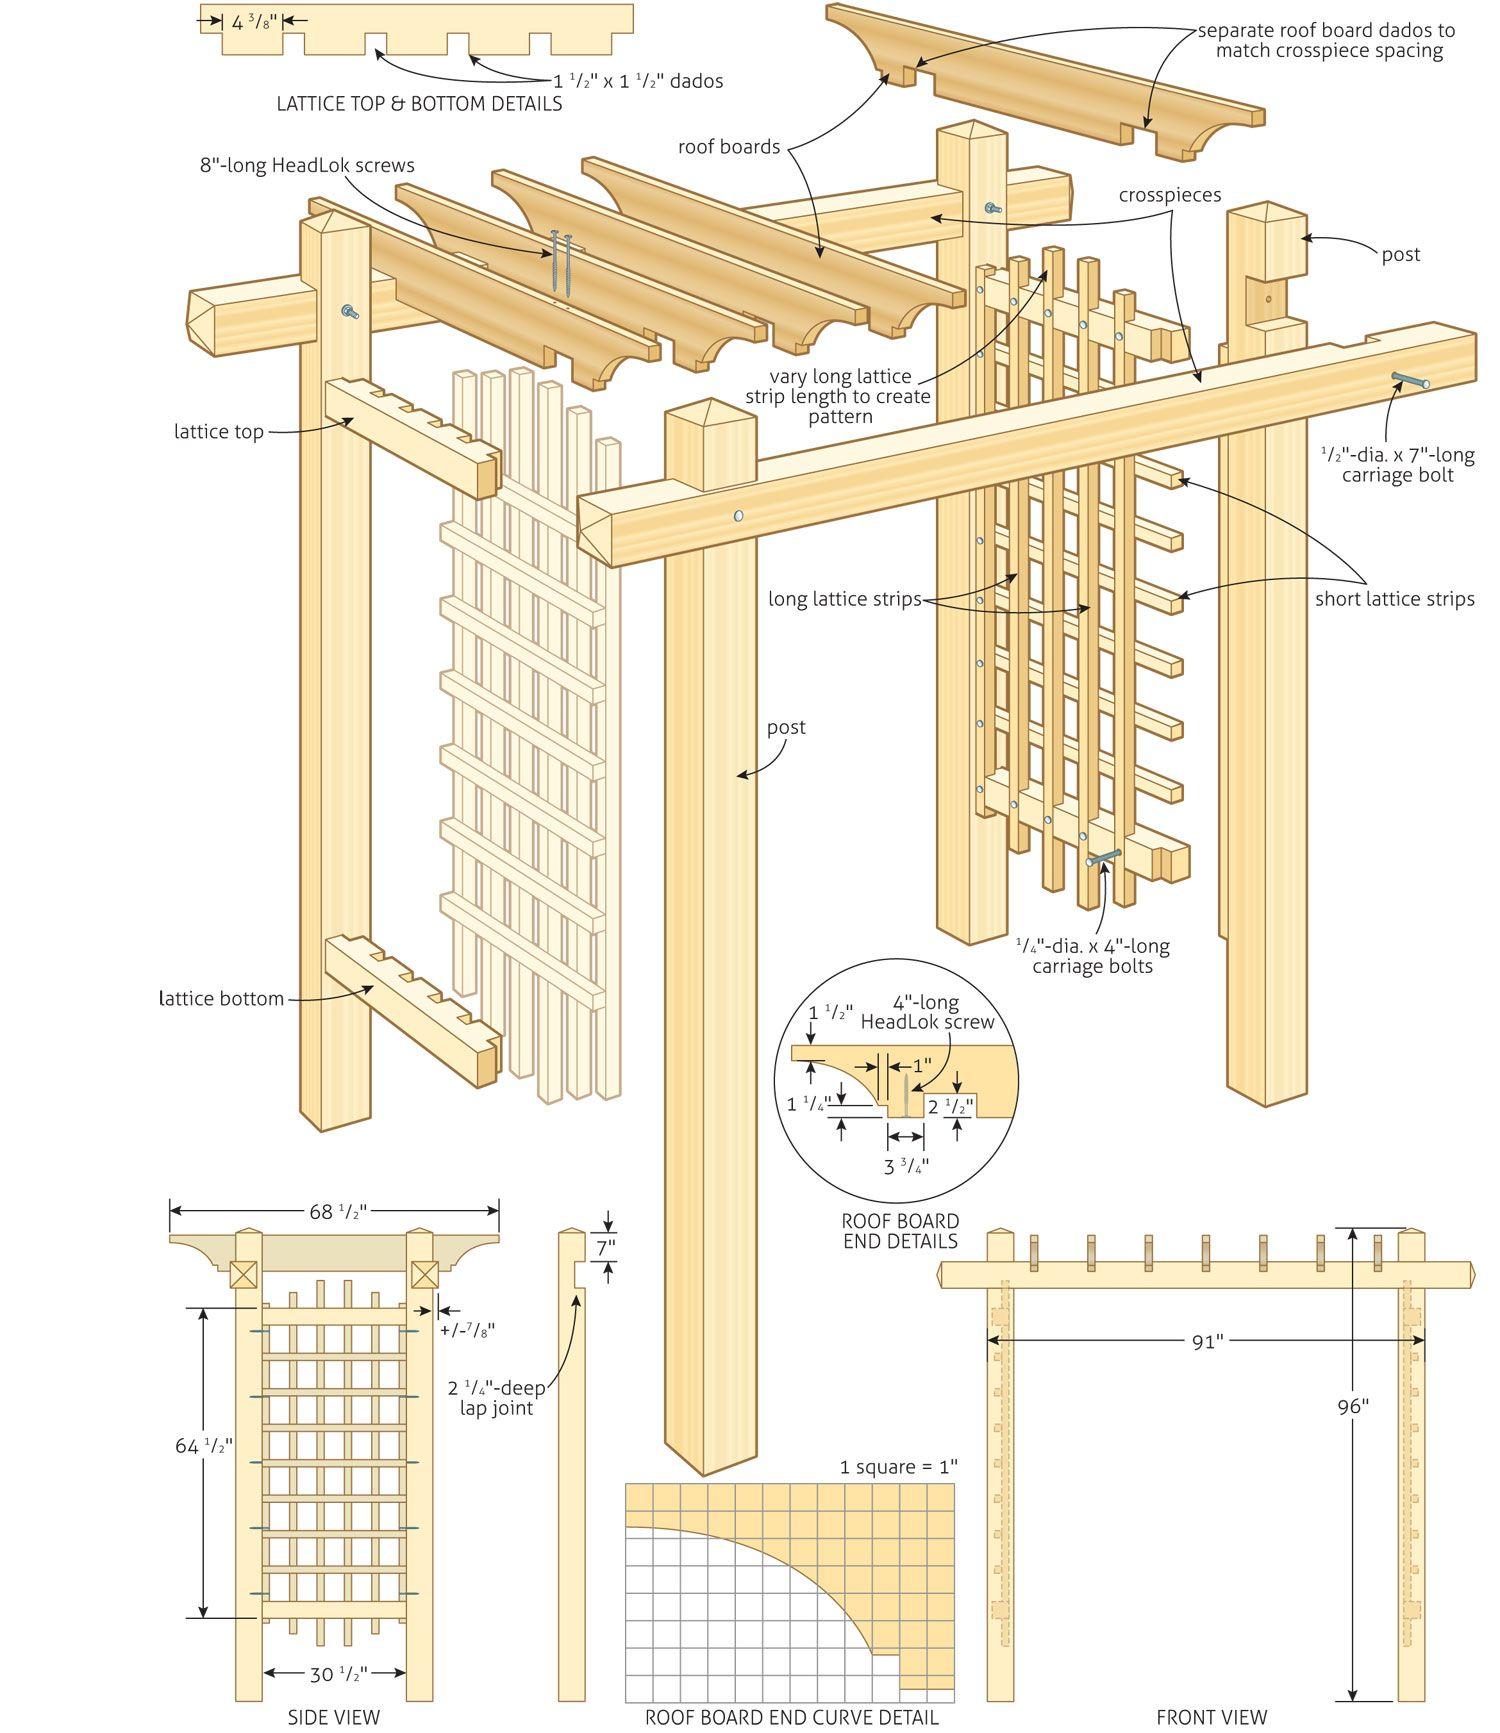 medium resolution of wiring diagram for pergola wiring diagram for you wiring diagram for pergola